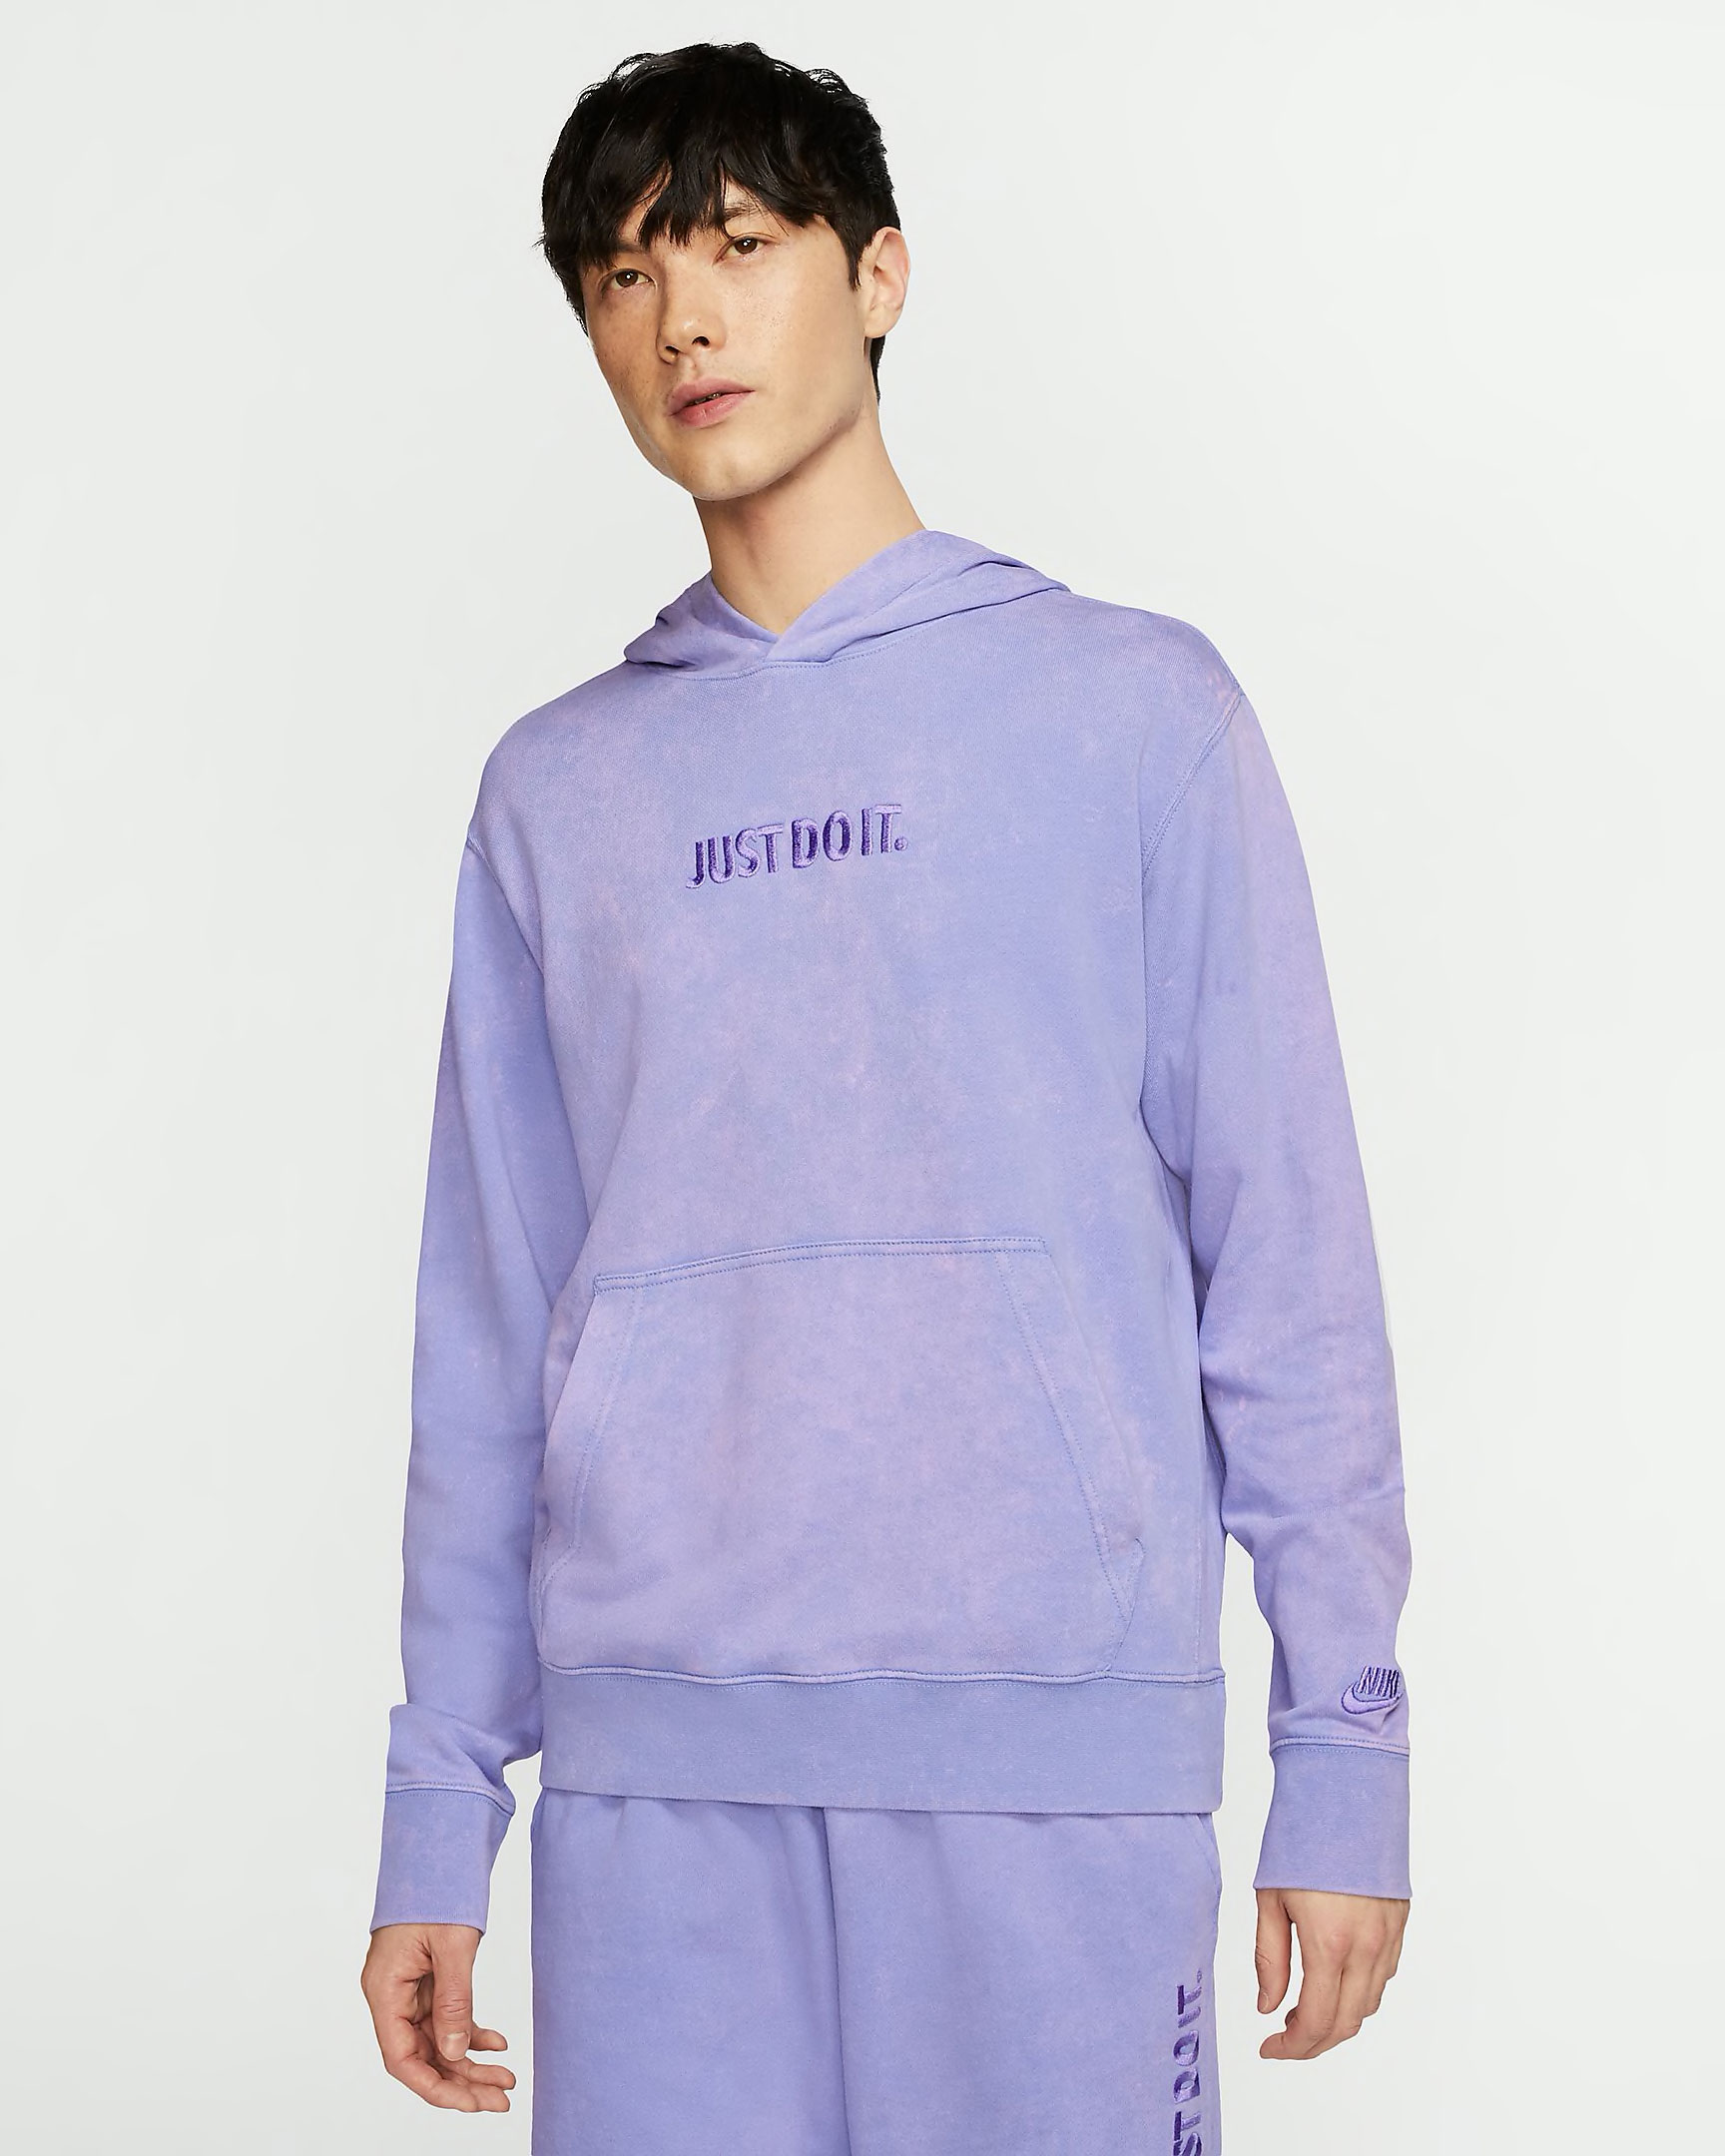 nike-jdi-just-do-it-hoodie-purple